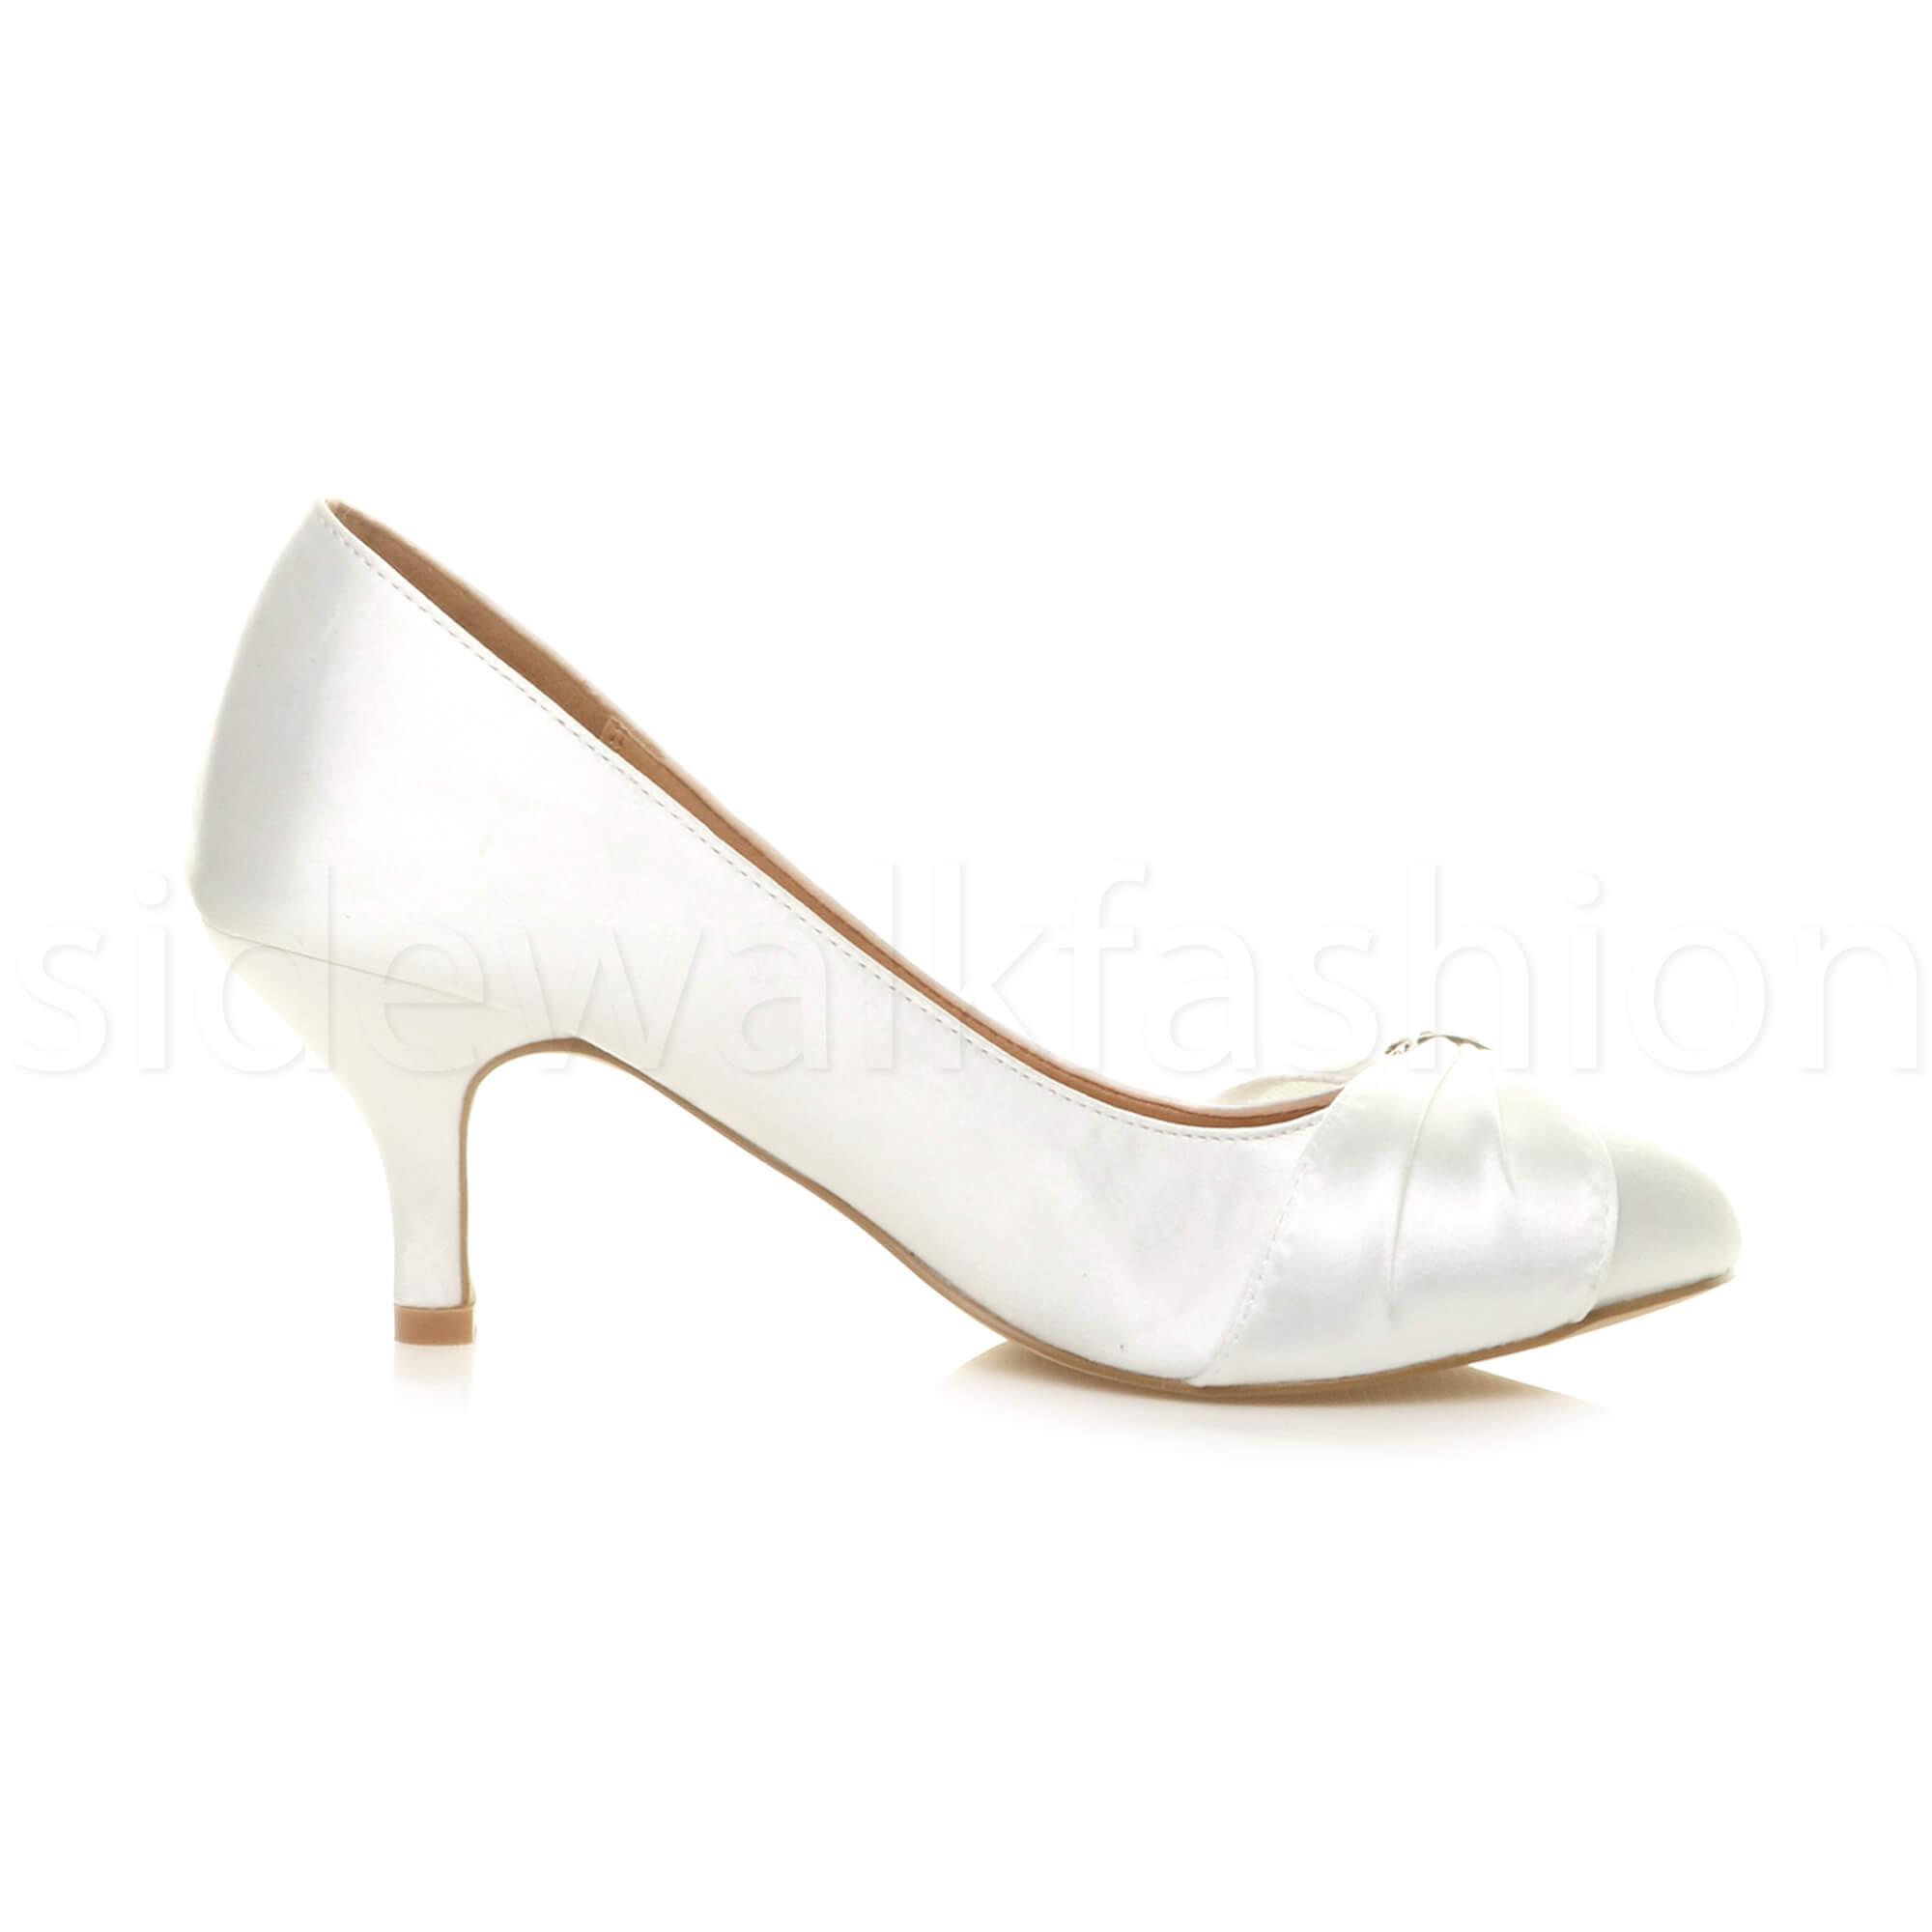 Womens-ladies-low-mid-heel-diamante-party-smart-evening-court-shoes-size thumbnail 108